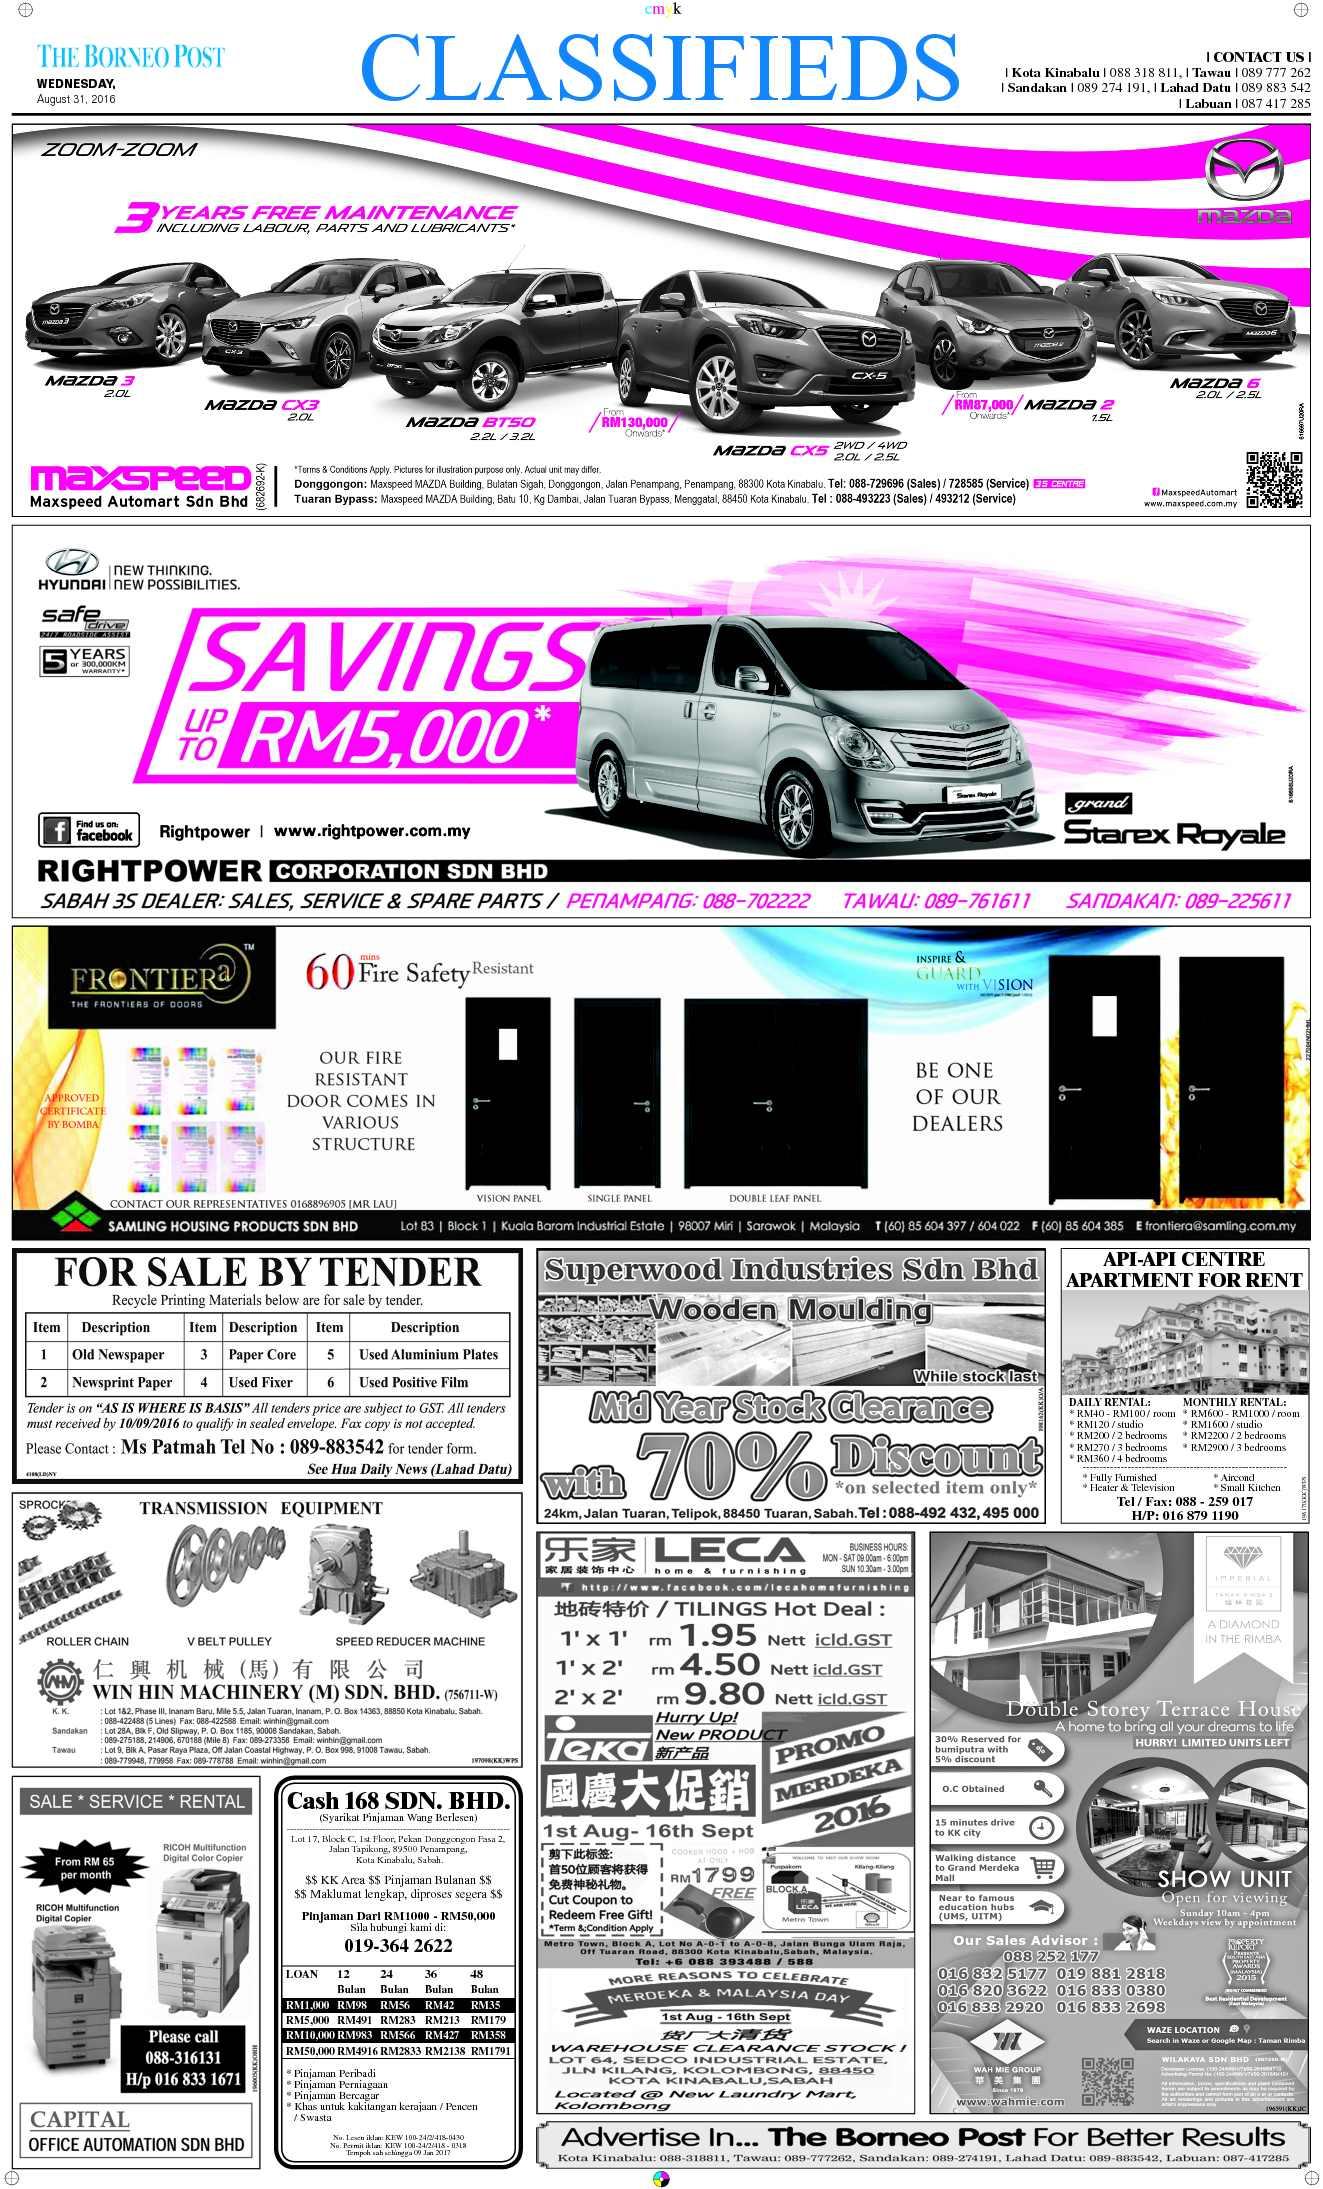 Wednesday - Aug 31 | The Borneo Post Classifieds